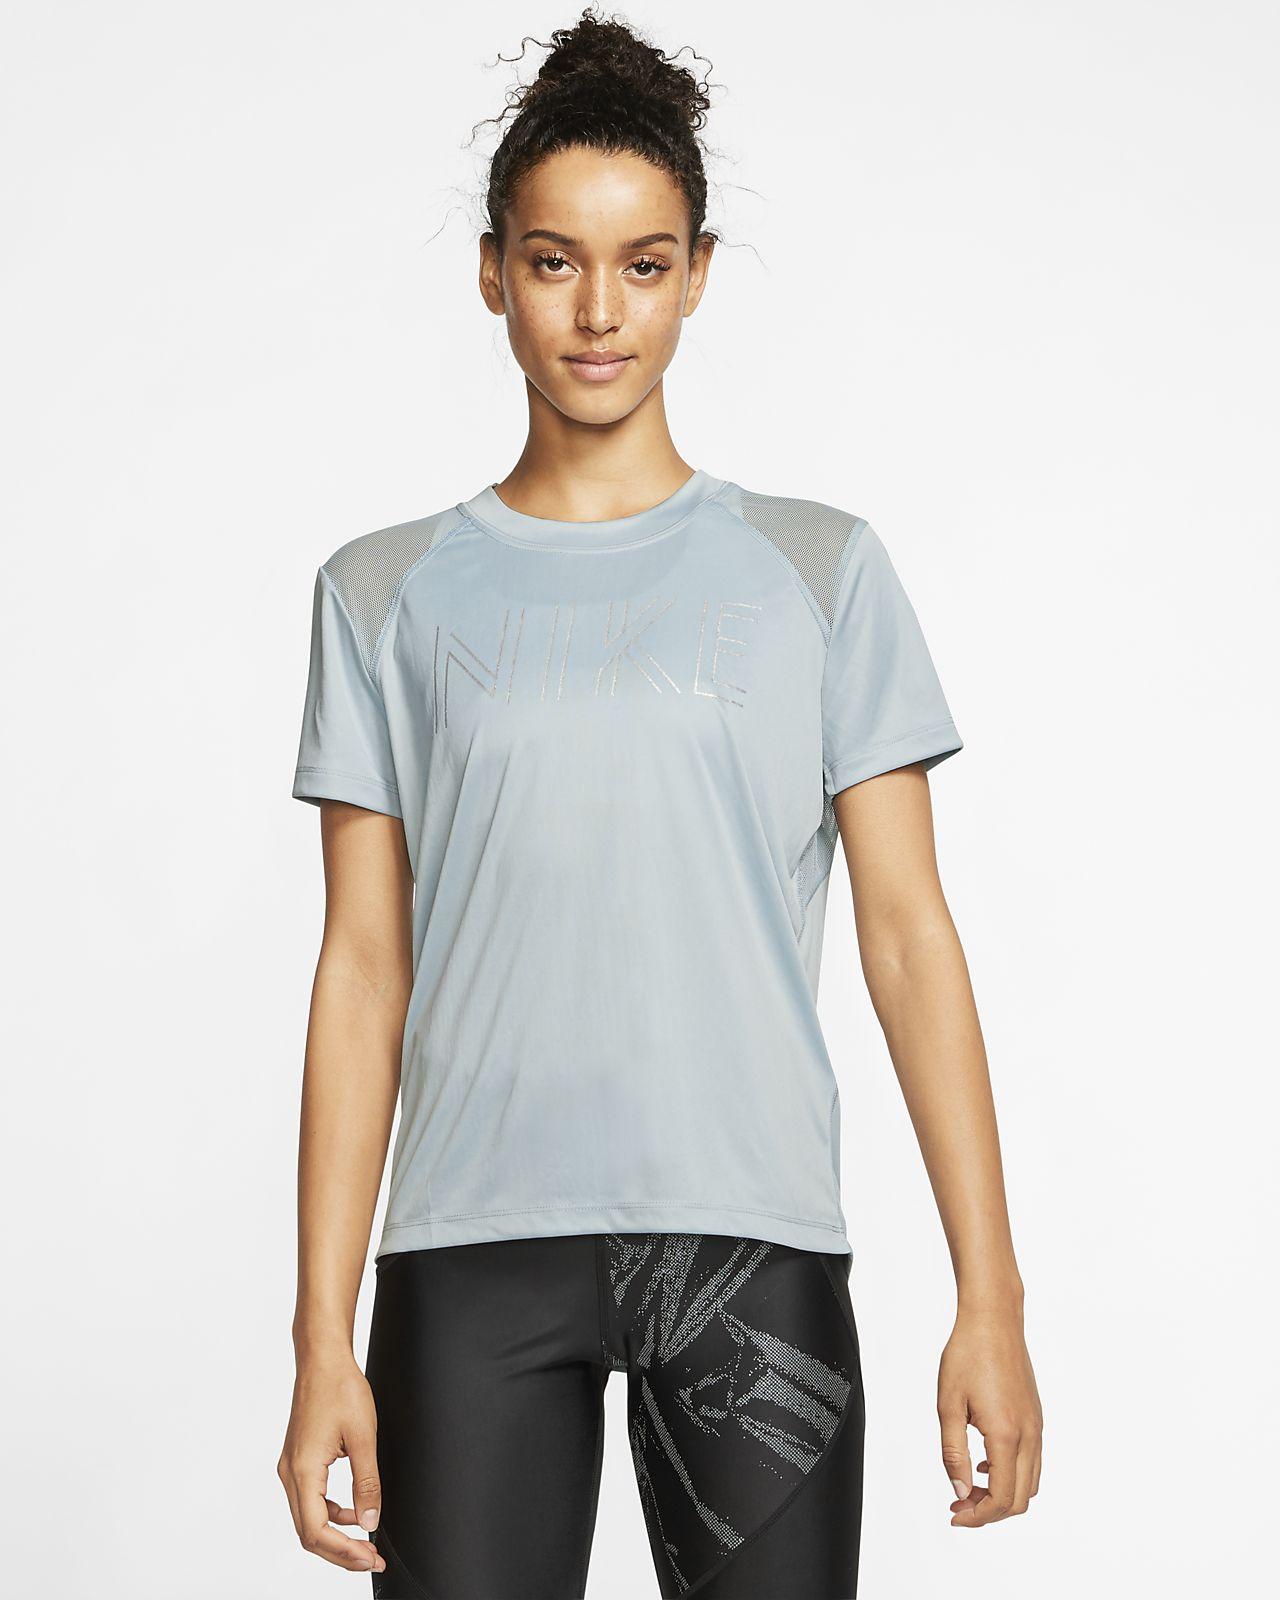 Nike Dri-FIT Miler Women's Short-Sleeve Metallic Running Top